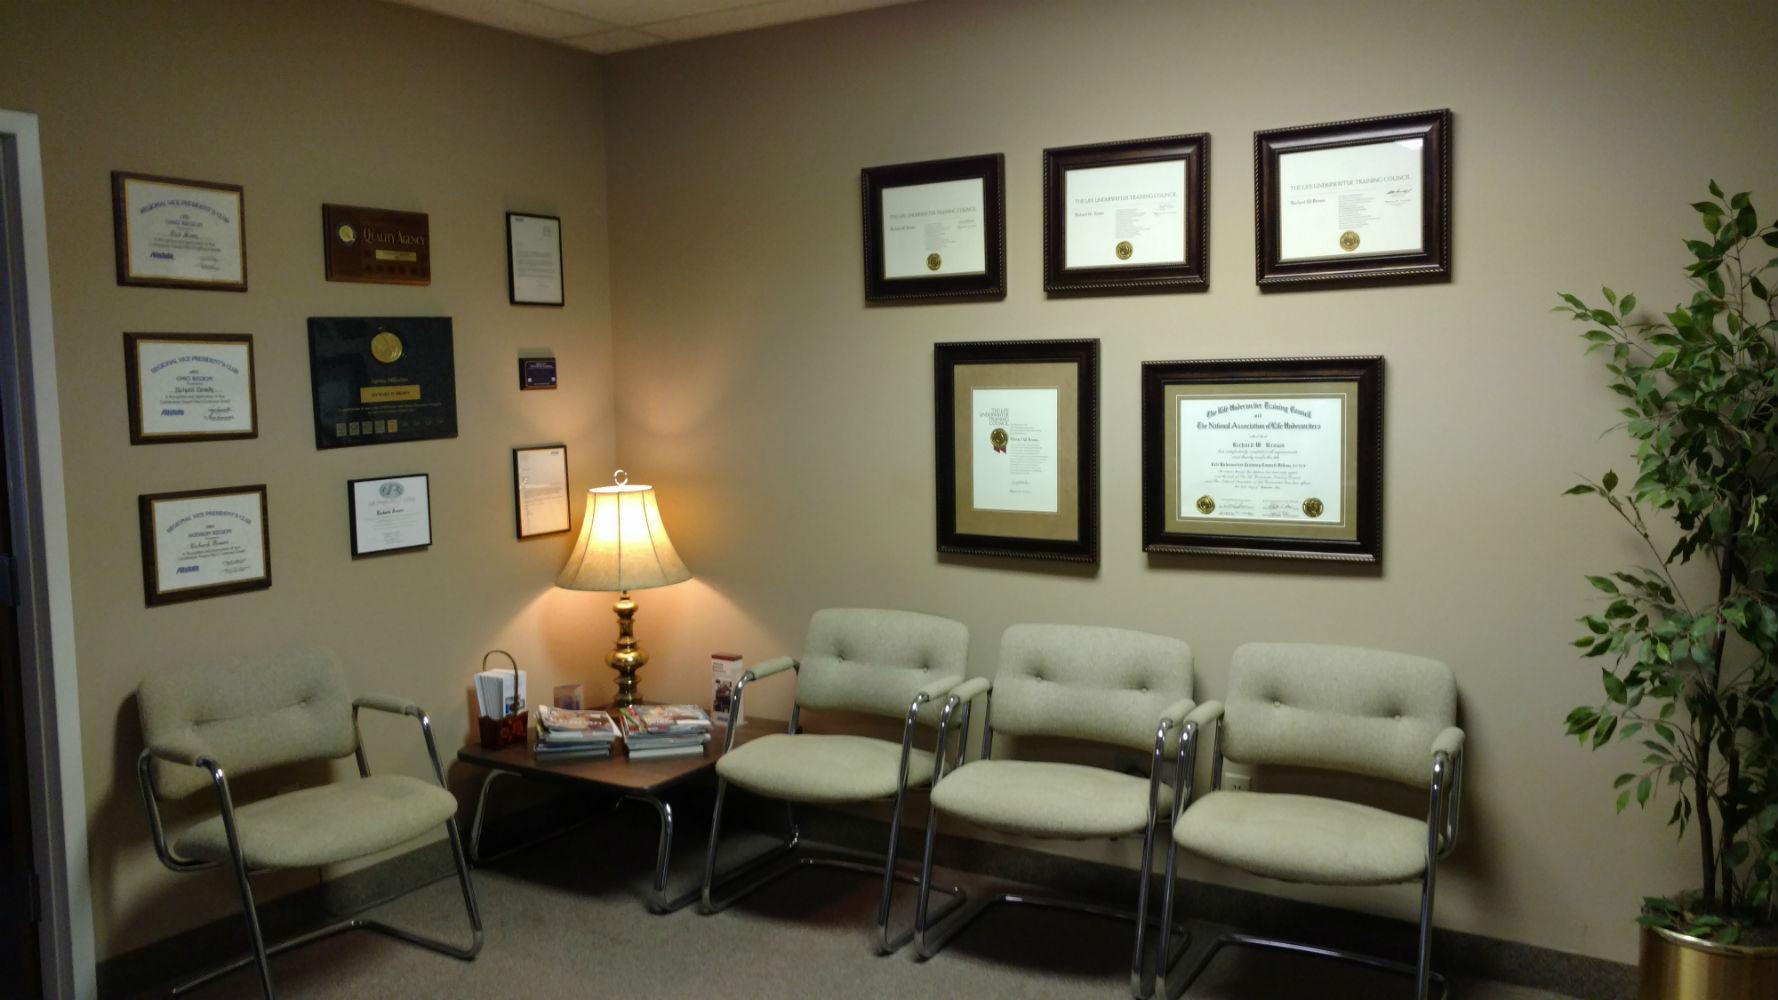 Richard W. Brown: Allstate Insurance image 1